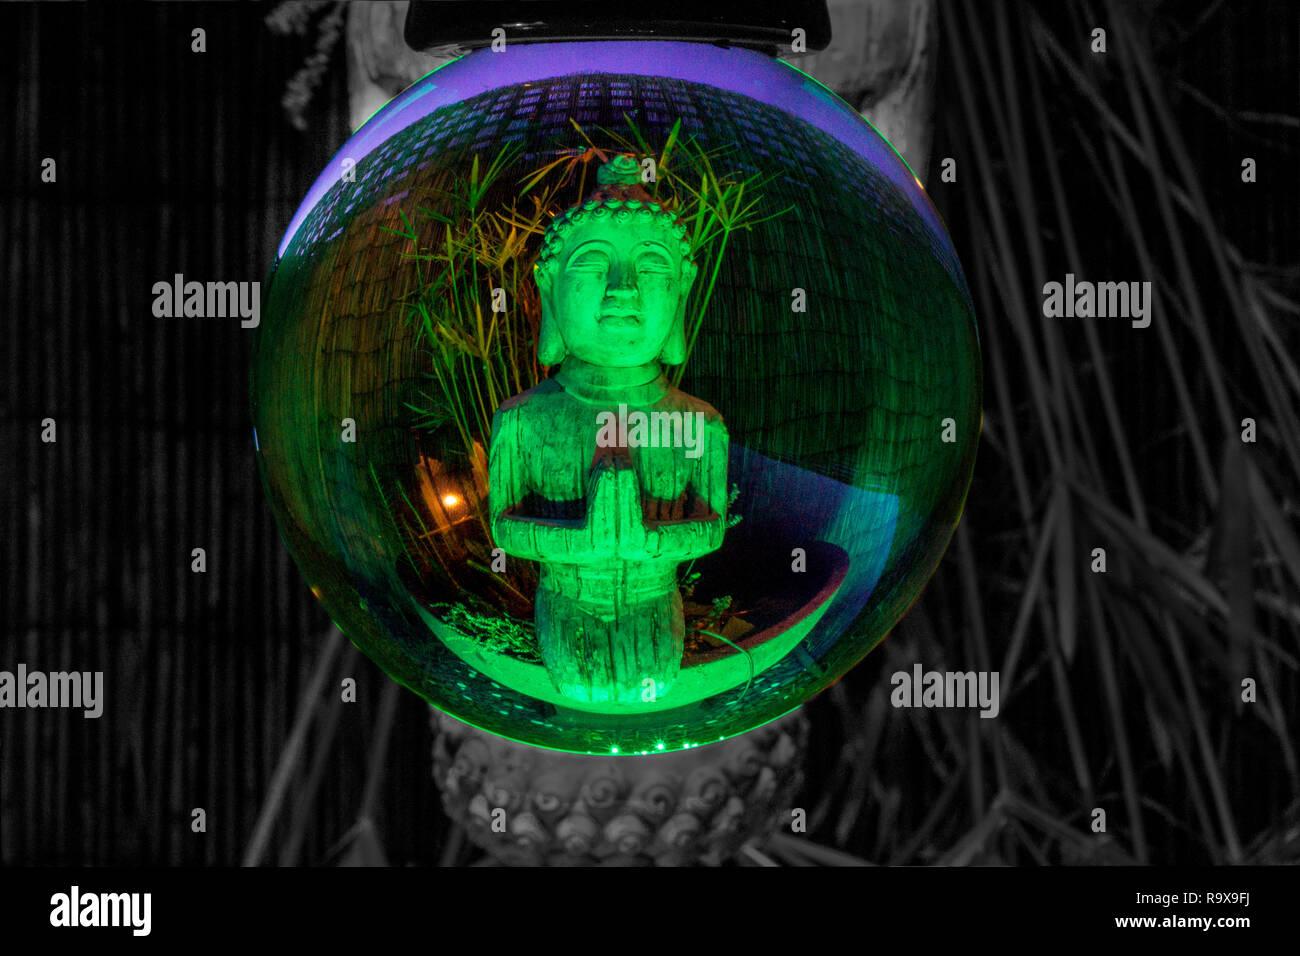 glass ball photography - Stock Image